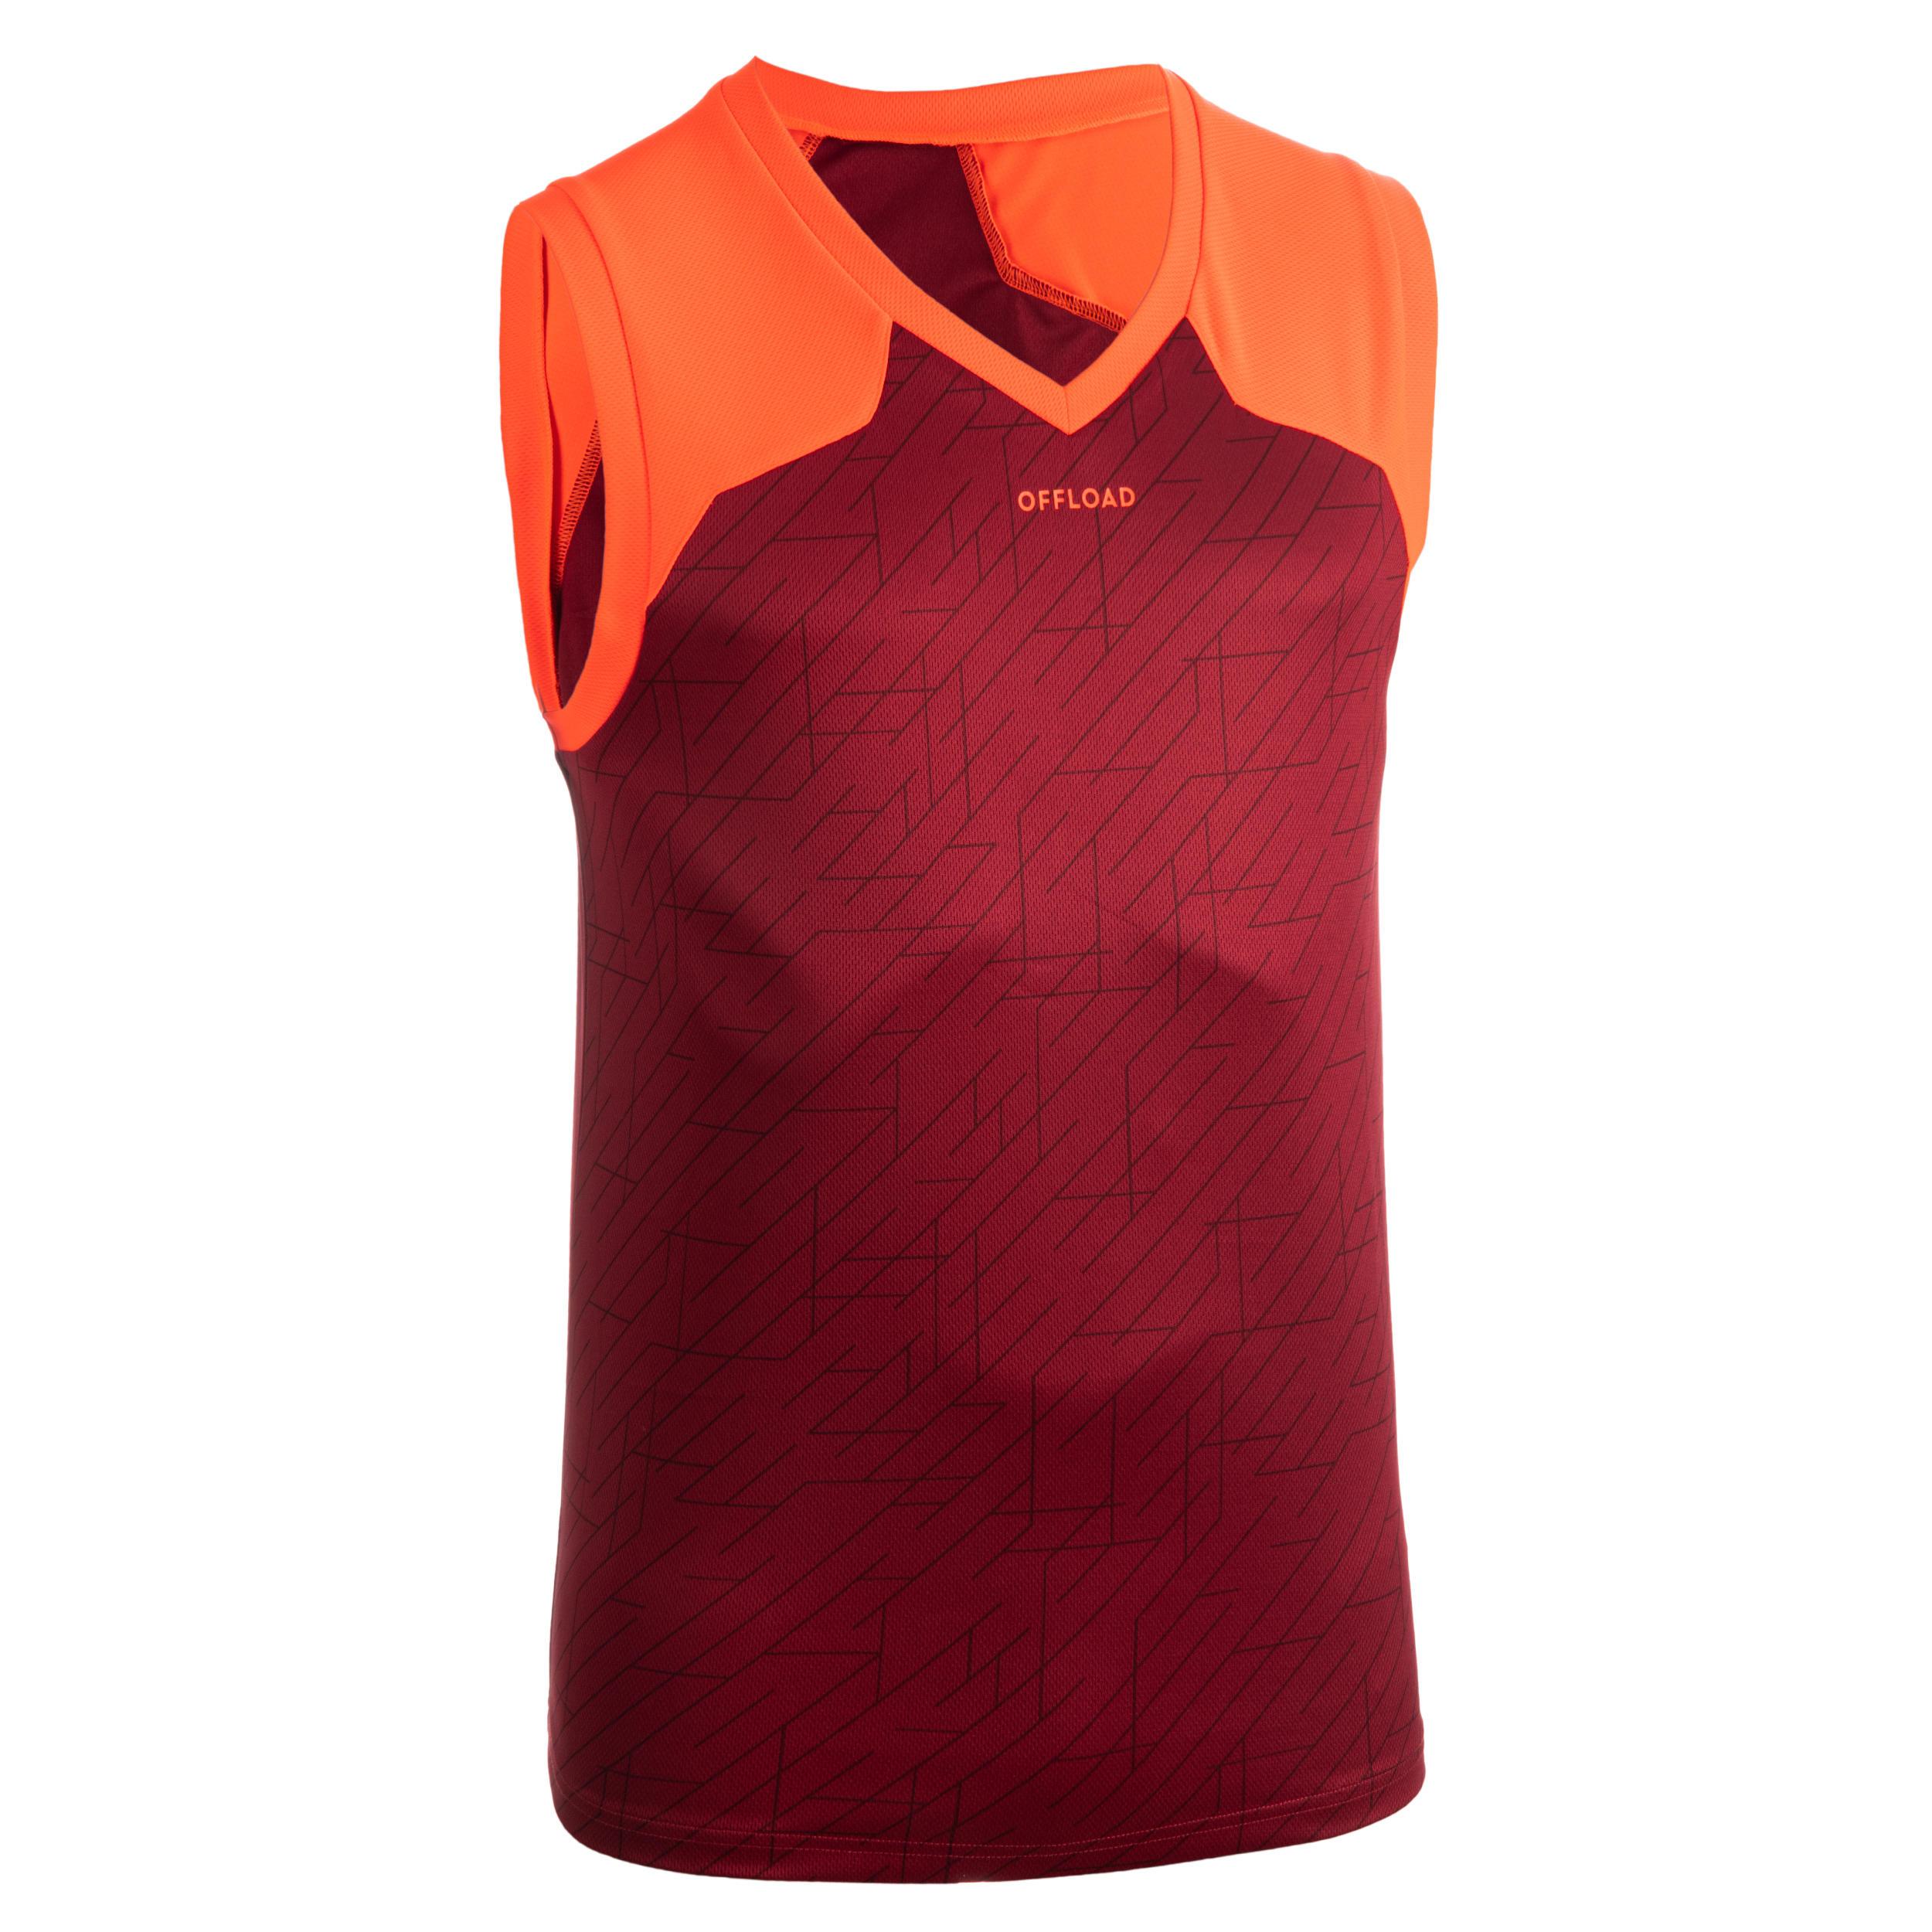 Rugbytrikot ärmellos R500 Herren   Sportbekleidung > Trikots > Sonstige Trikots   Offload